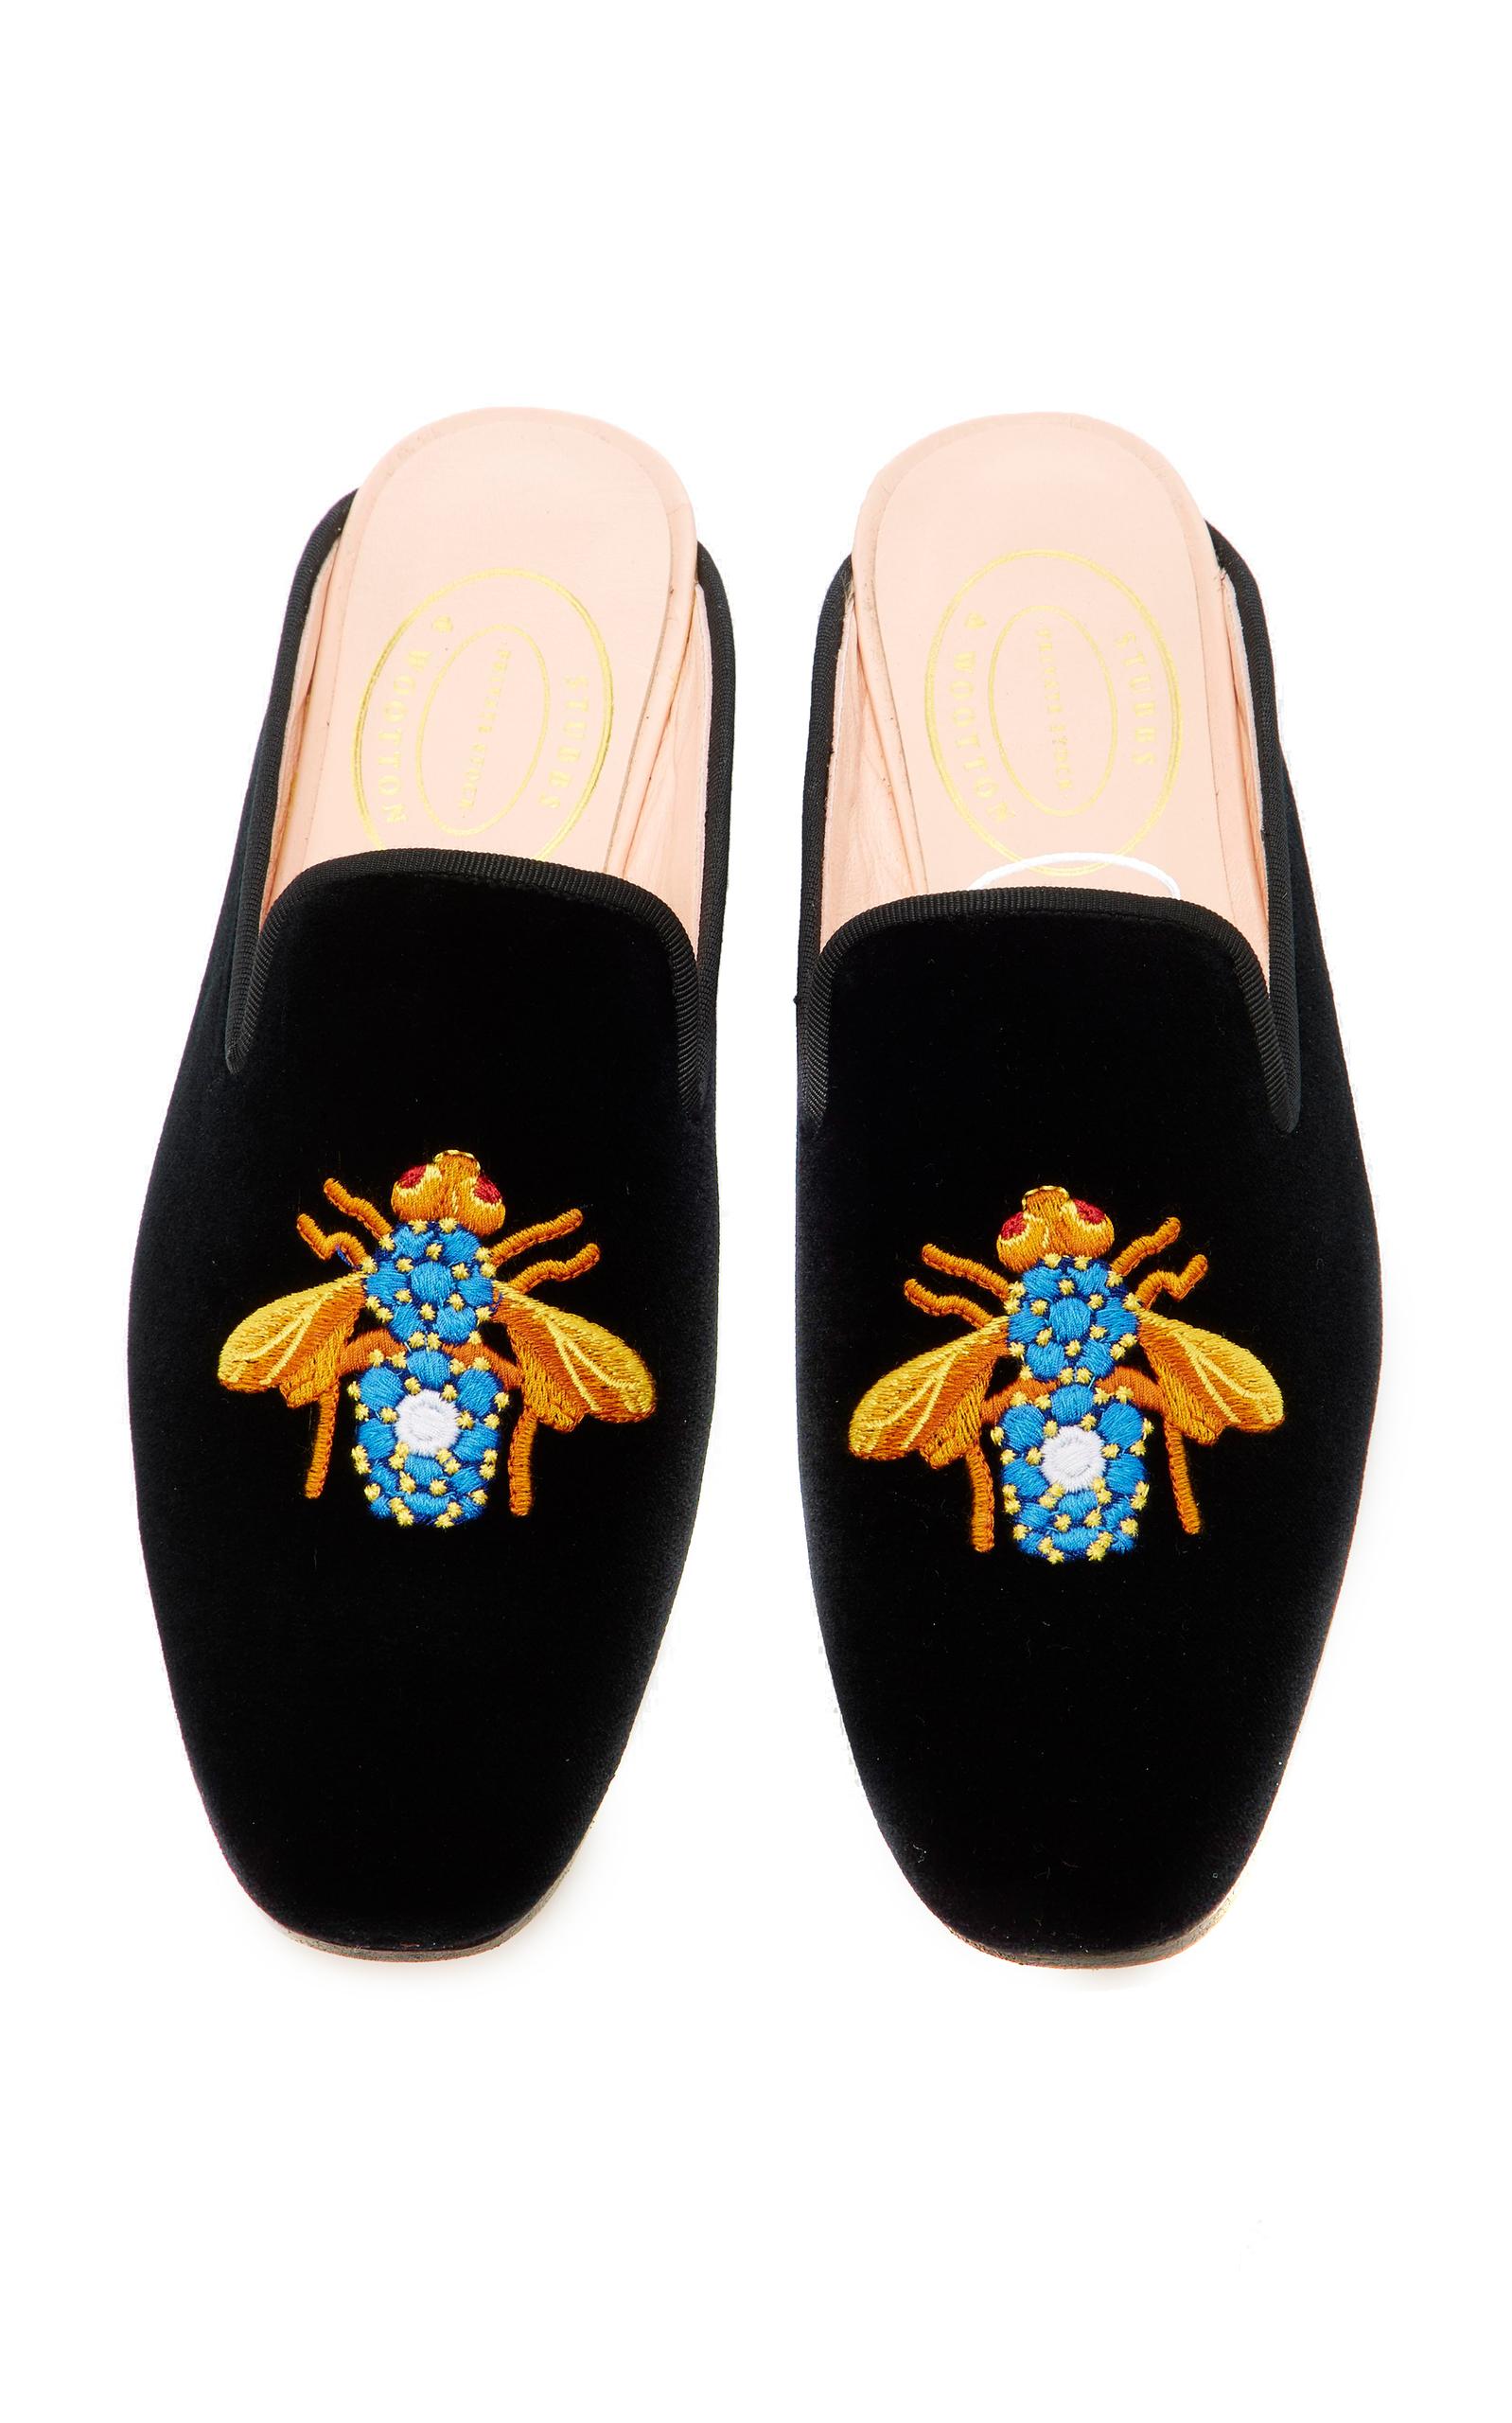 large_stubbs-wootton-black-abeille-ava-mule.jpg (1598×2560)